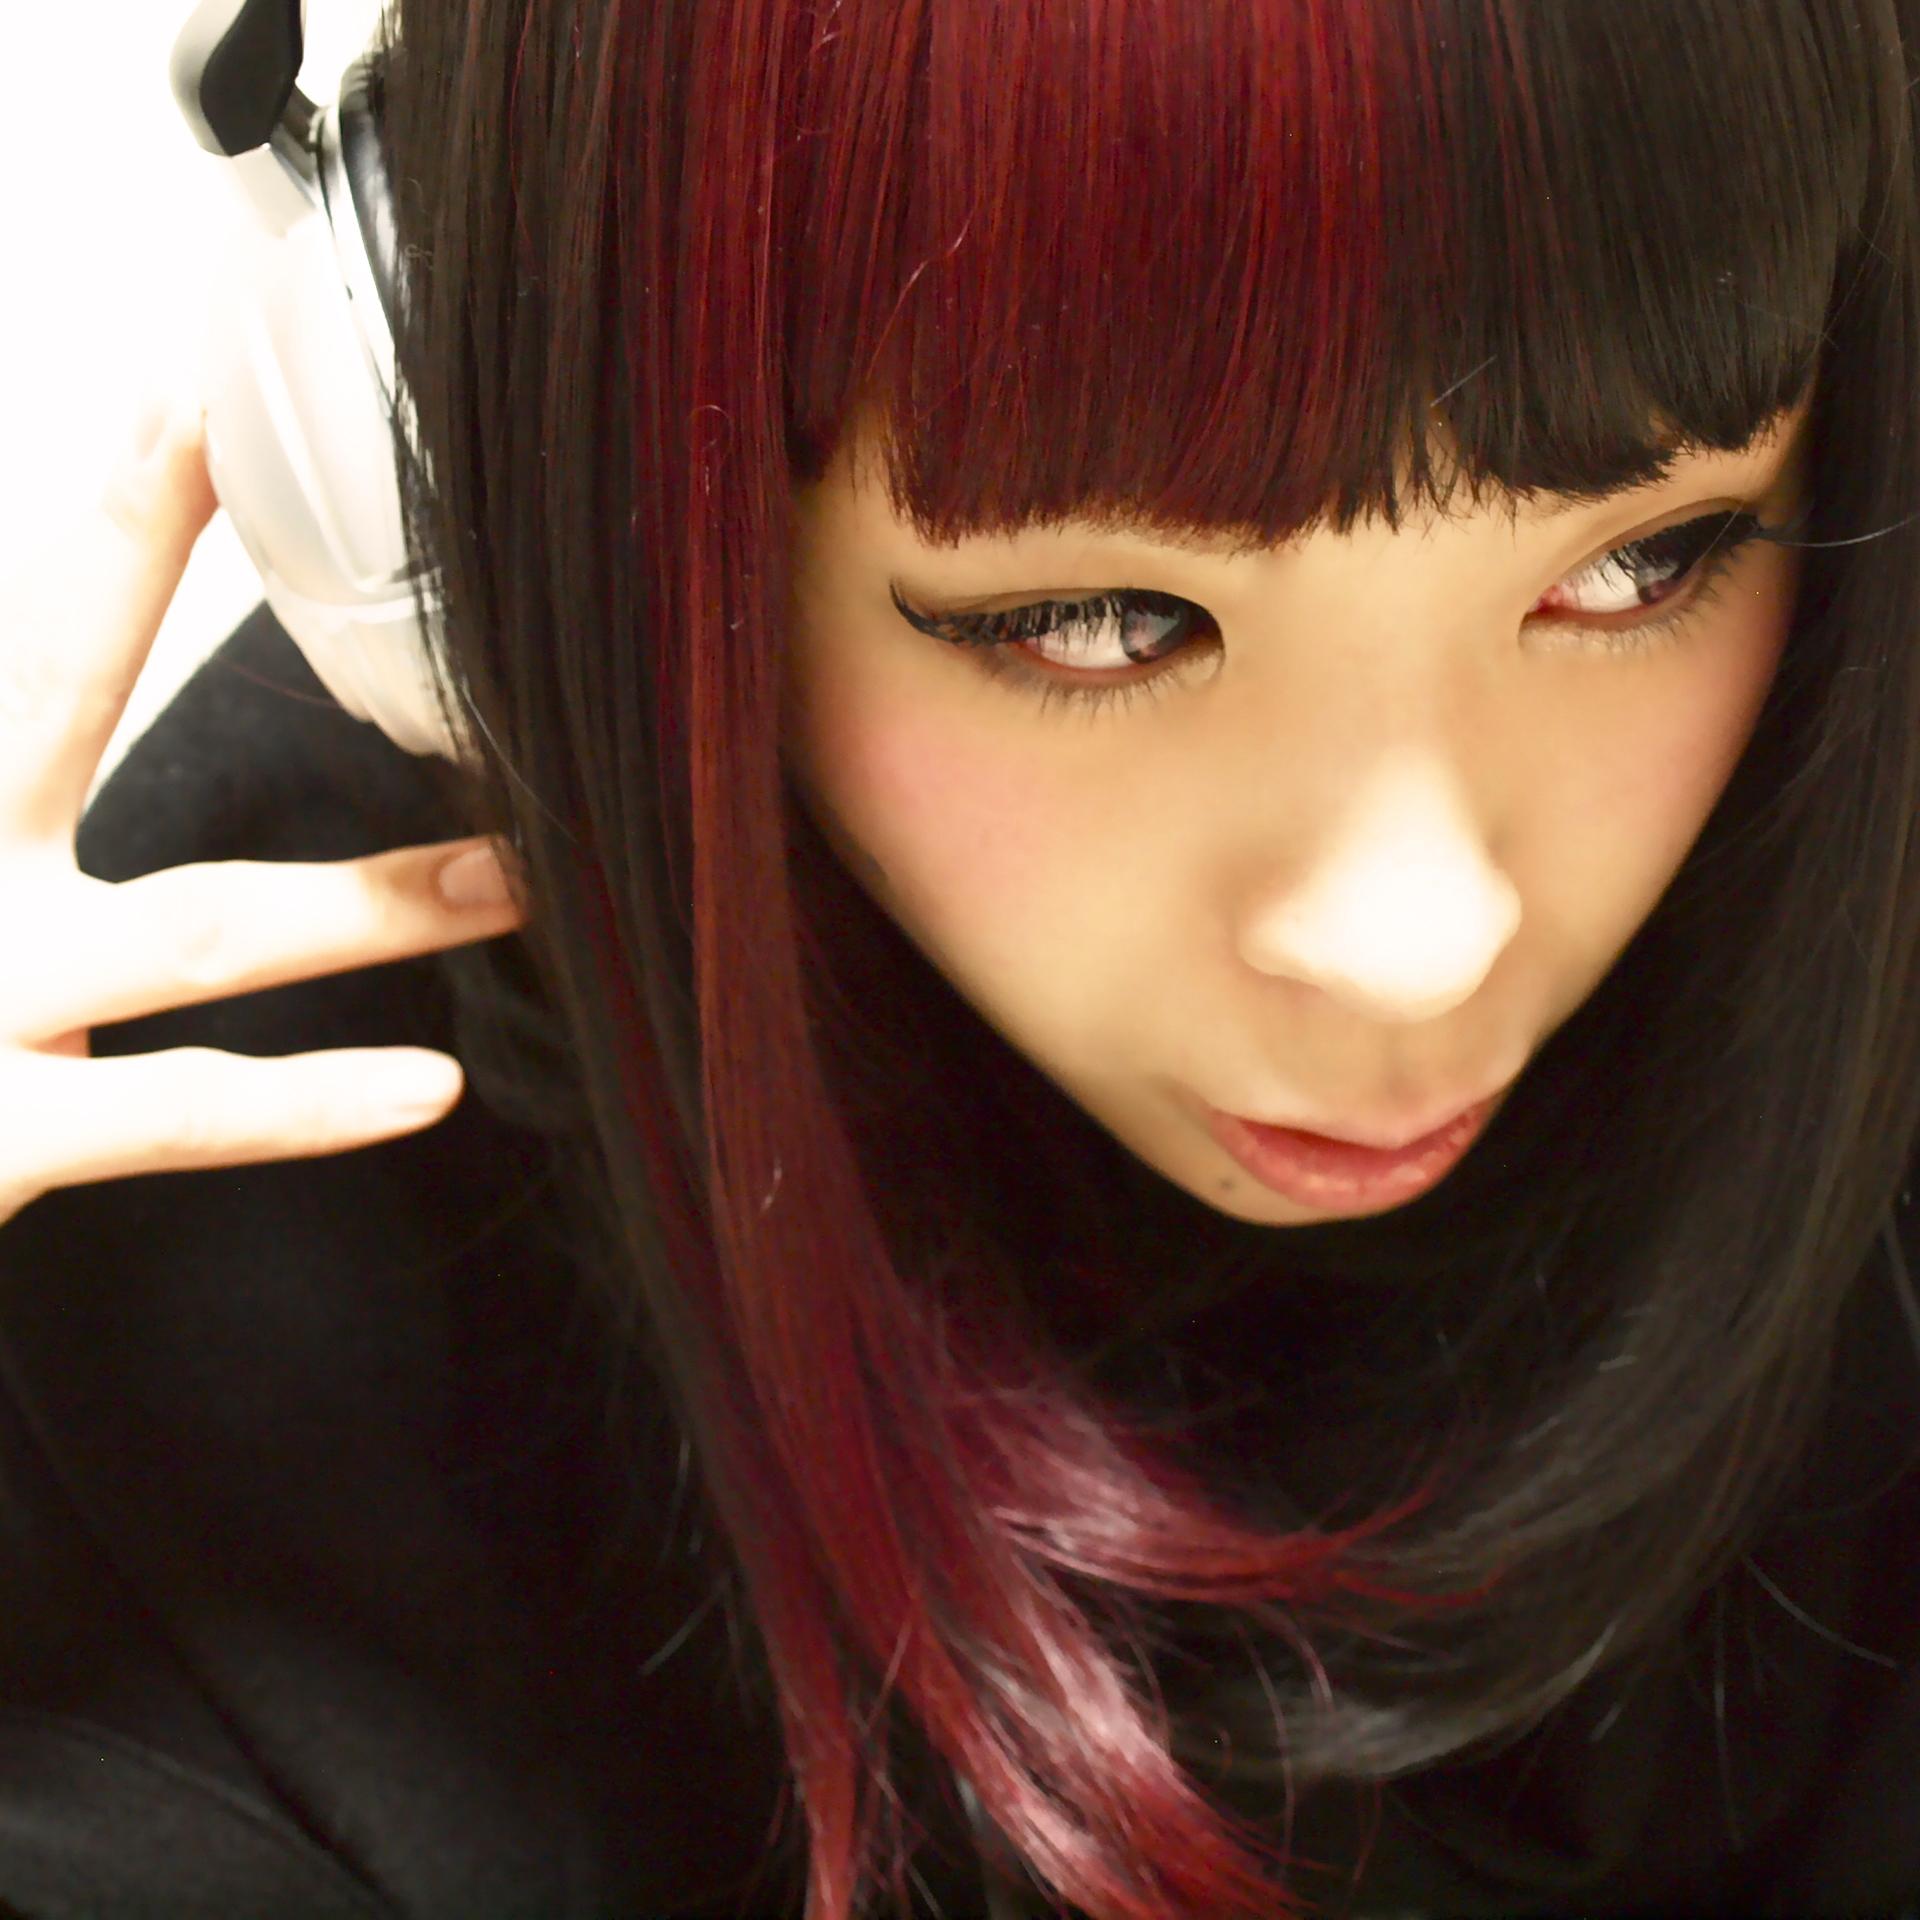 Adachi Hitomi